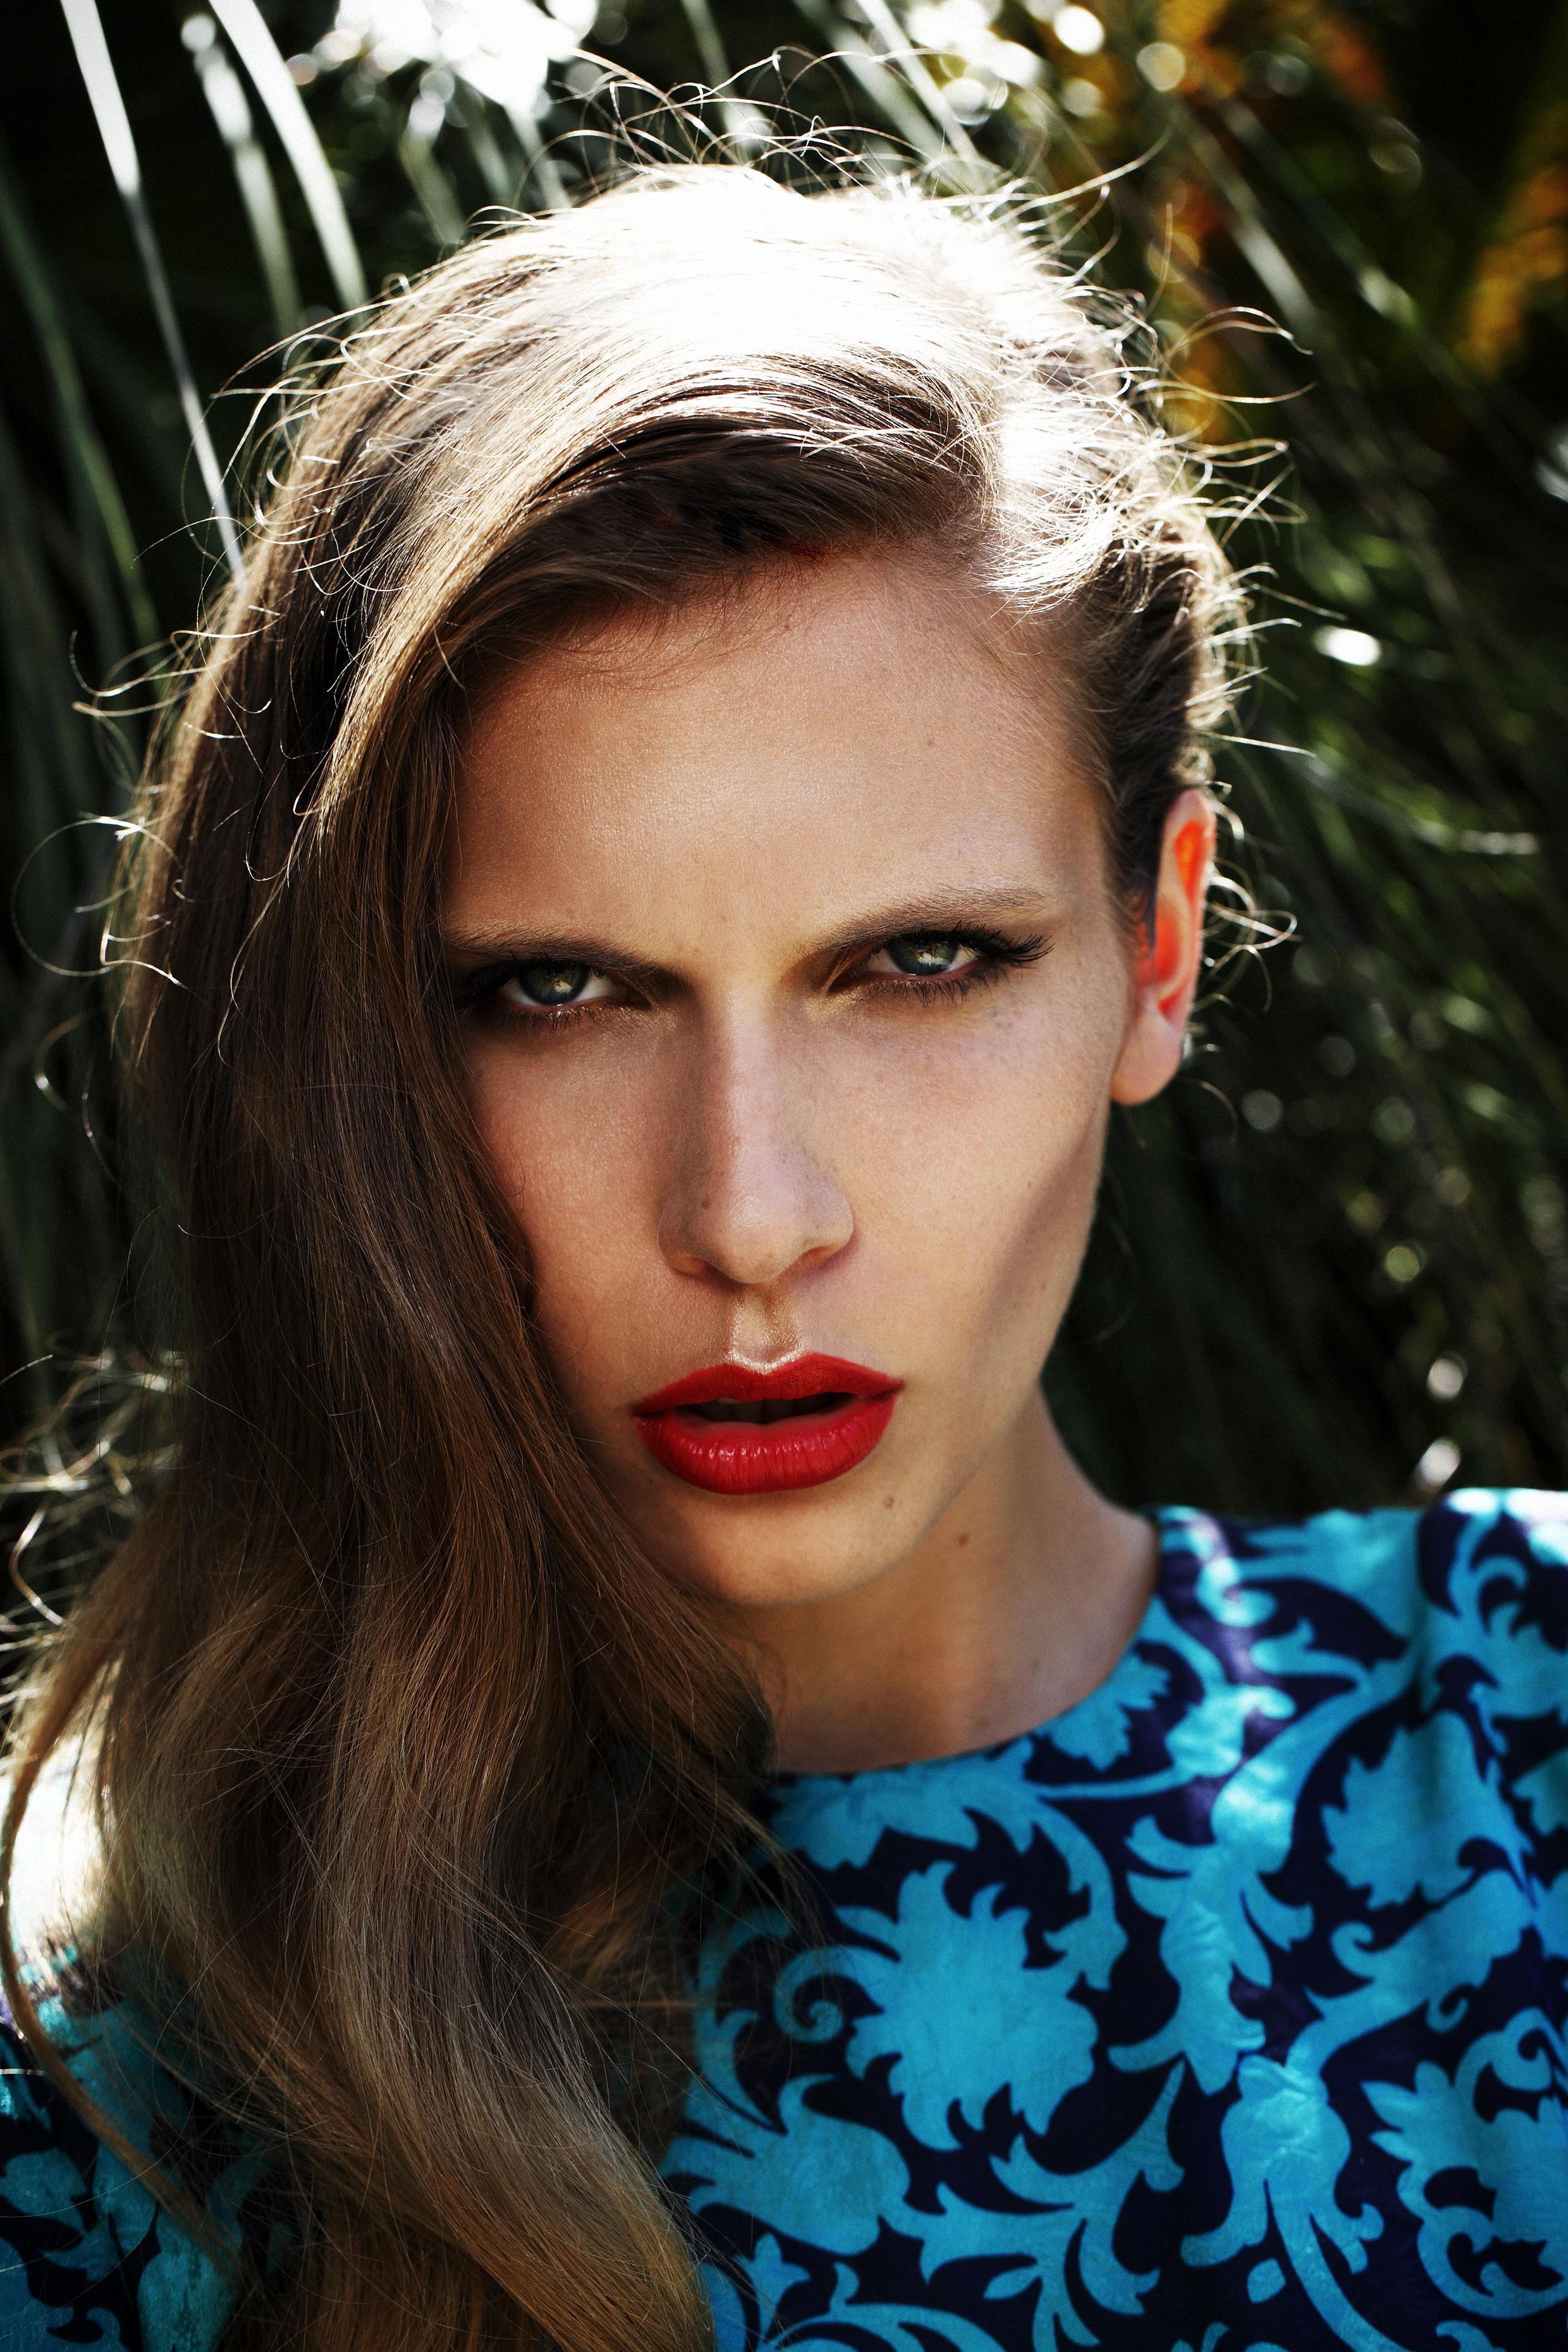 Makeup/Hair/Nails